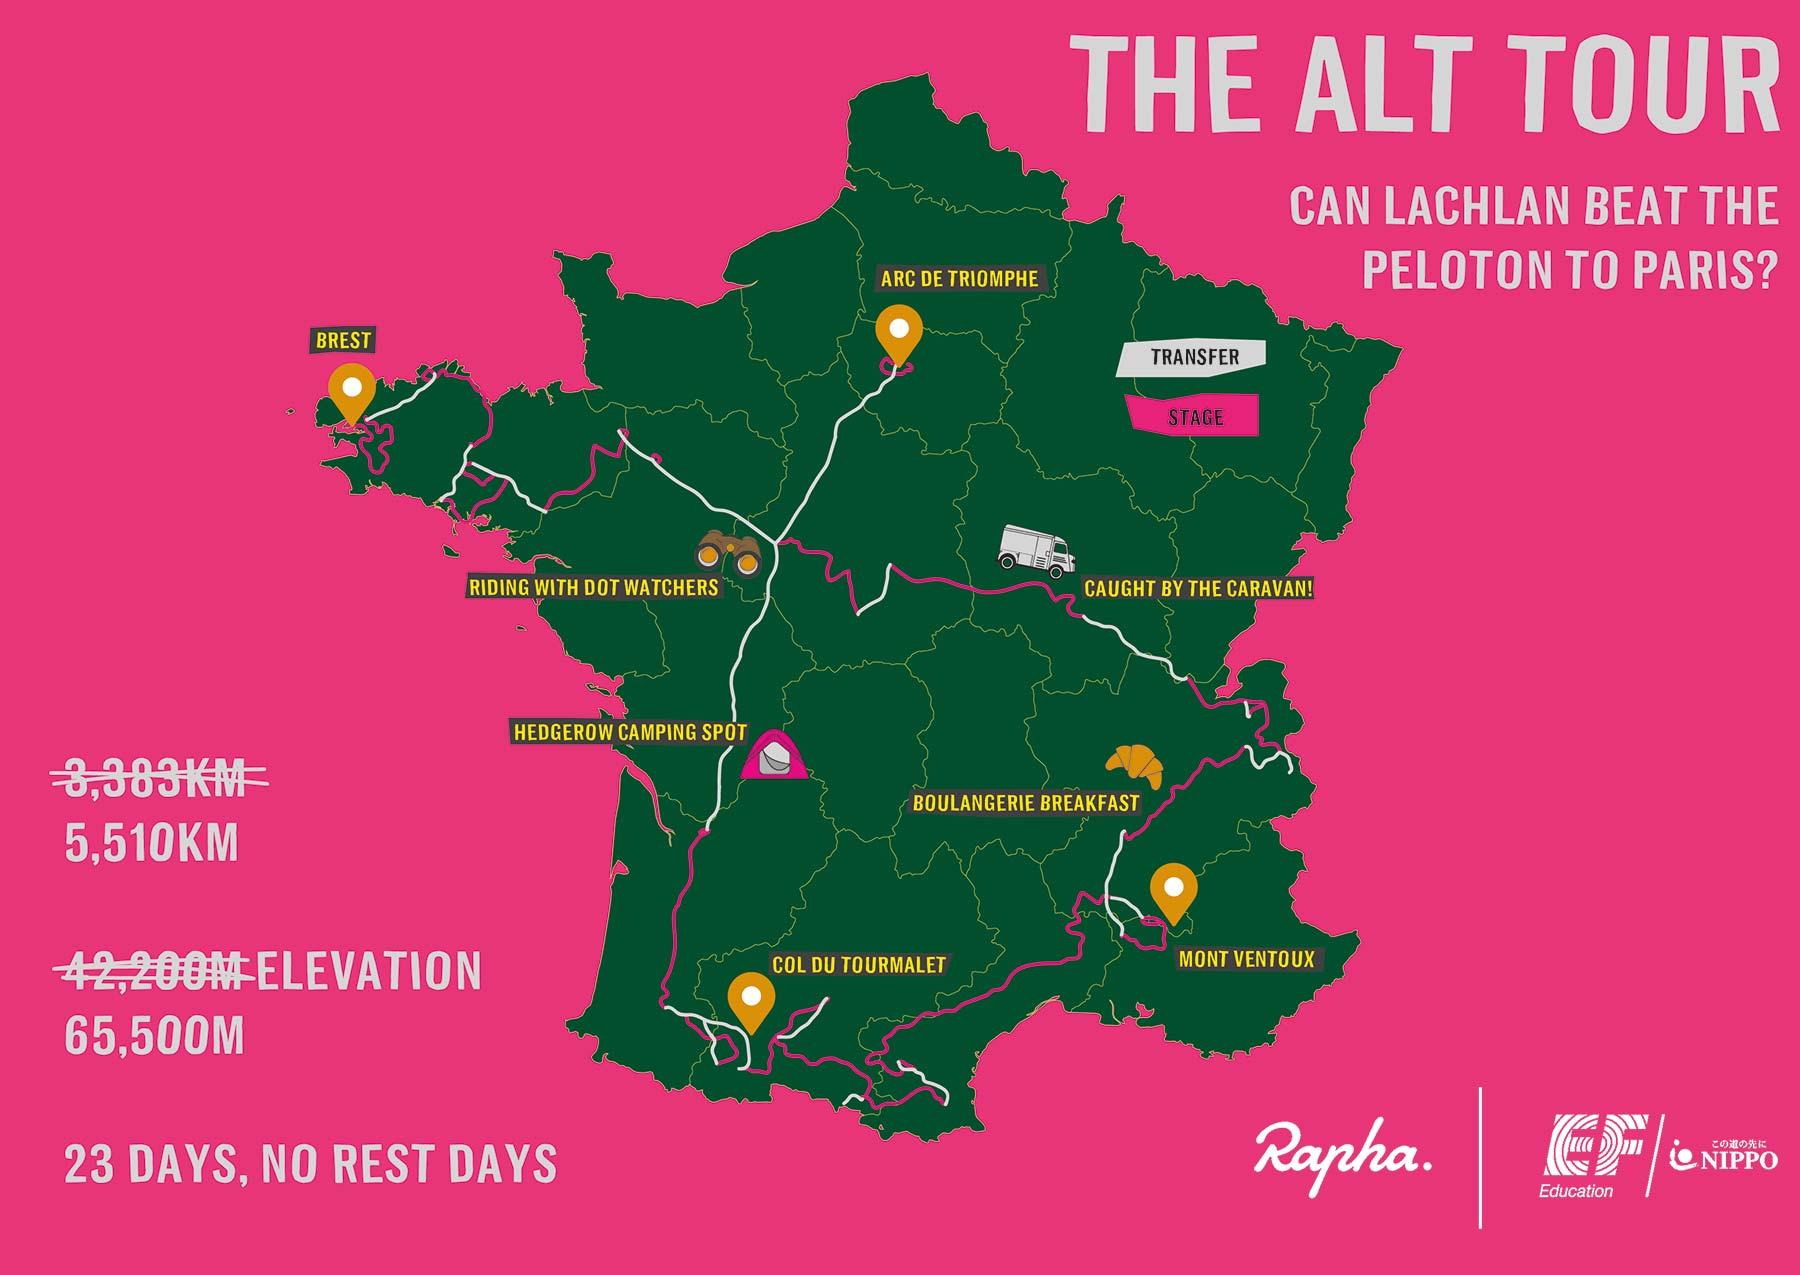 Lachlan Morton Alt Tour de France_ultra distance bikepacking charity ride, photo by Rapha, route